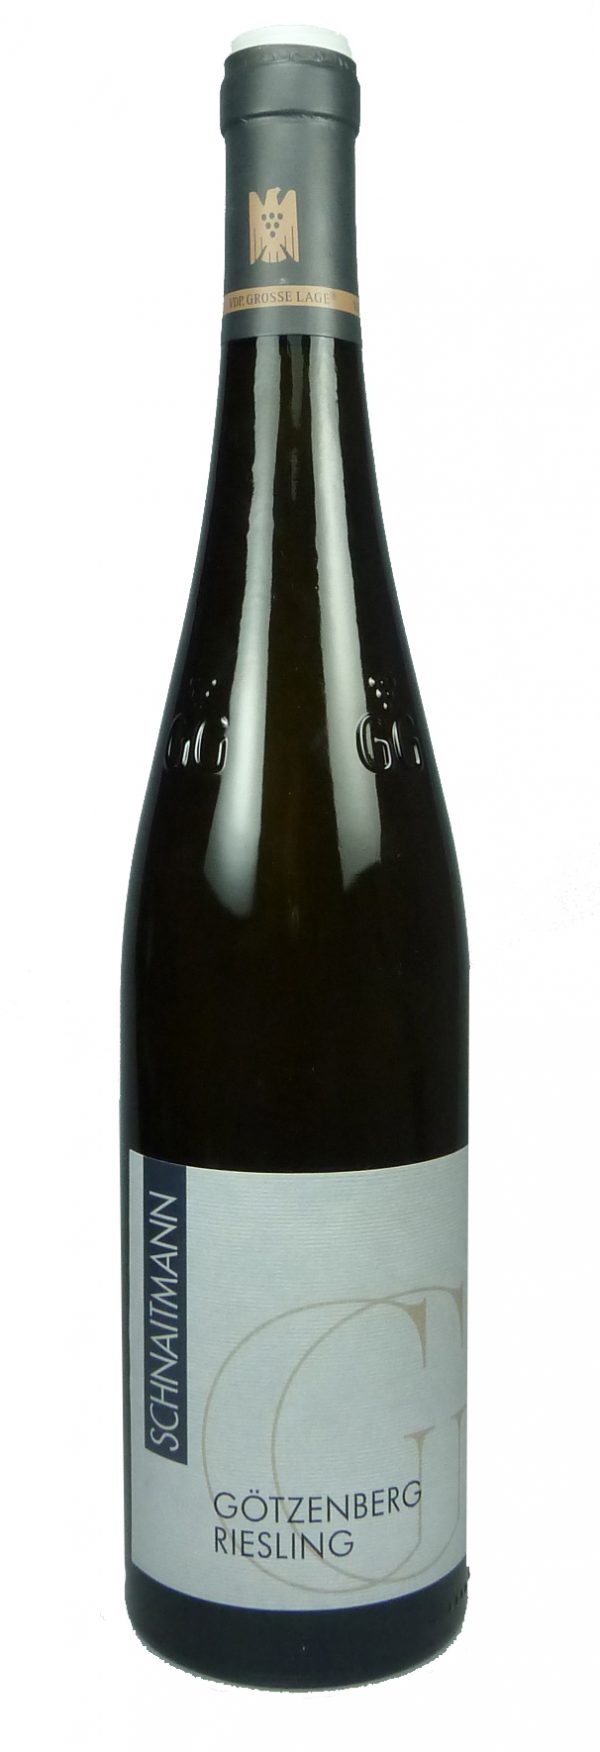 Götzenberg Riesling Großes Gewächs Qualitätswein trocken 2015